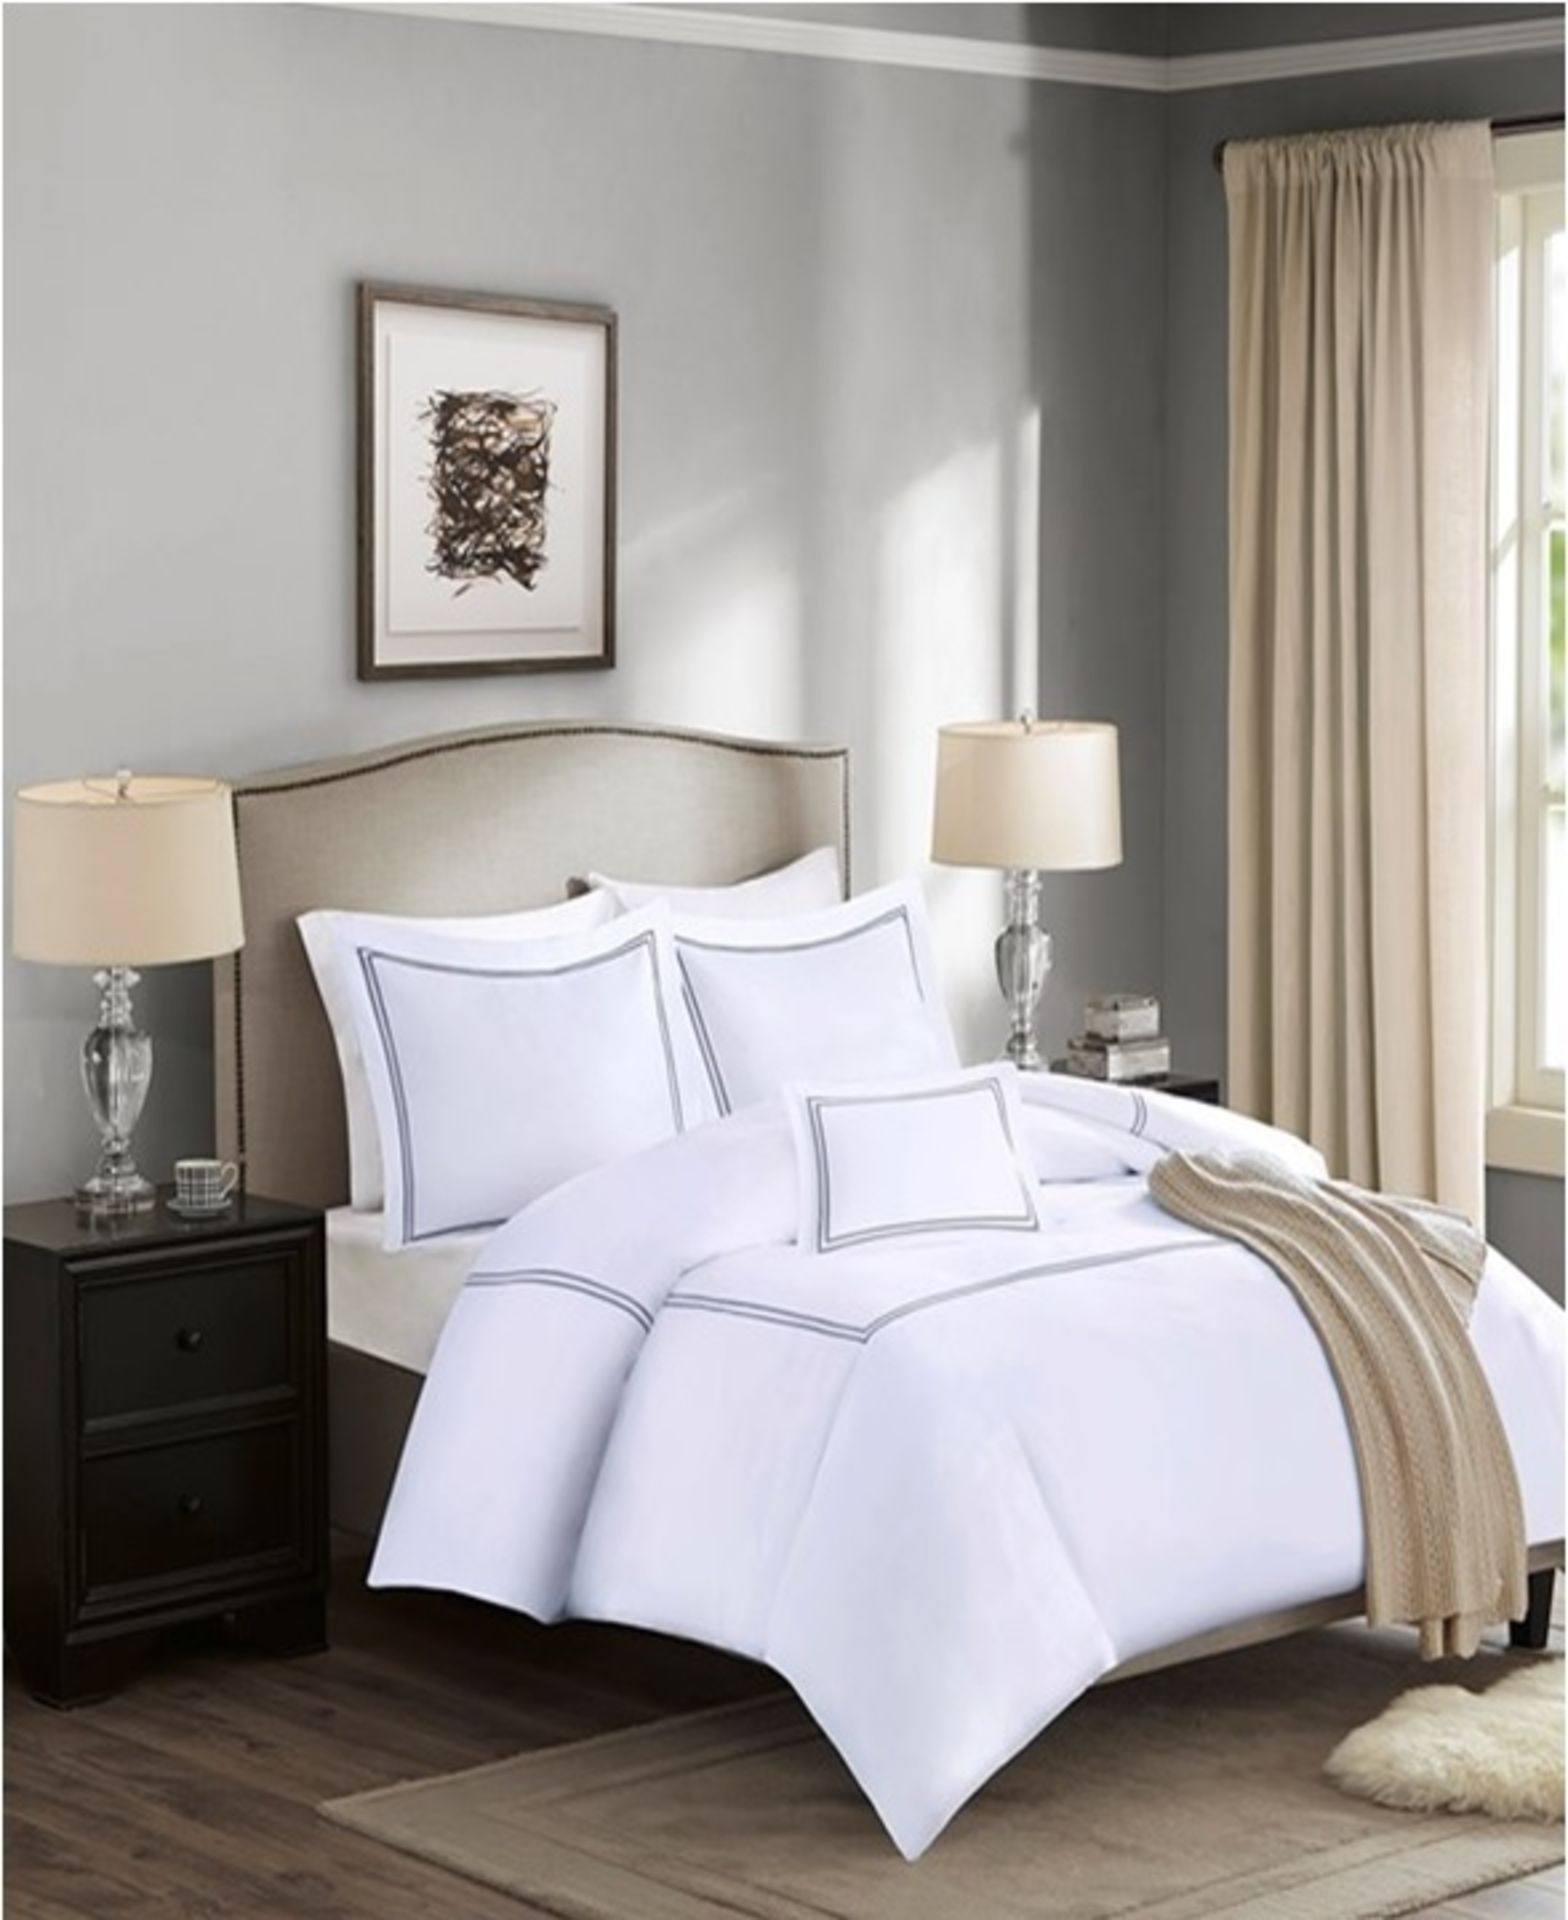 Lot 147 - 1 x Madison Park Luxury Collection Double Duvet Set White - Product Code MP12-0198UK (Brand New -